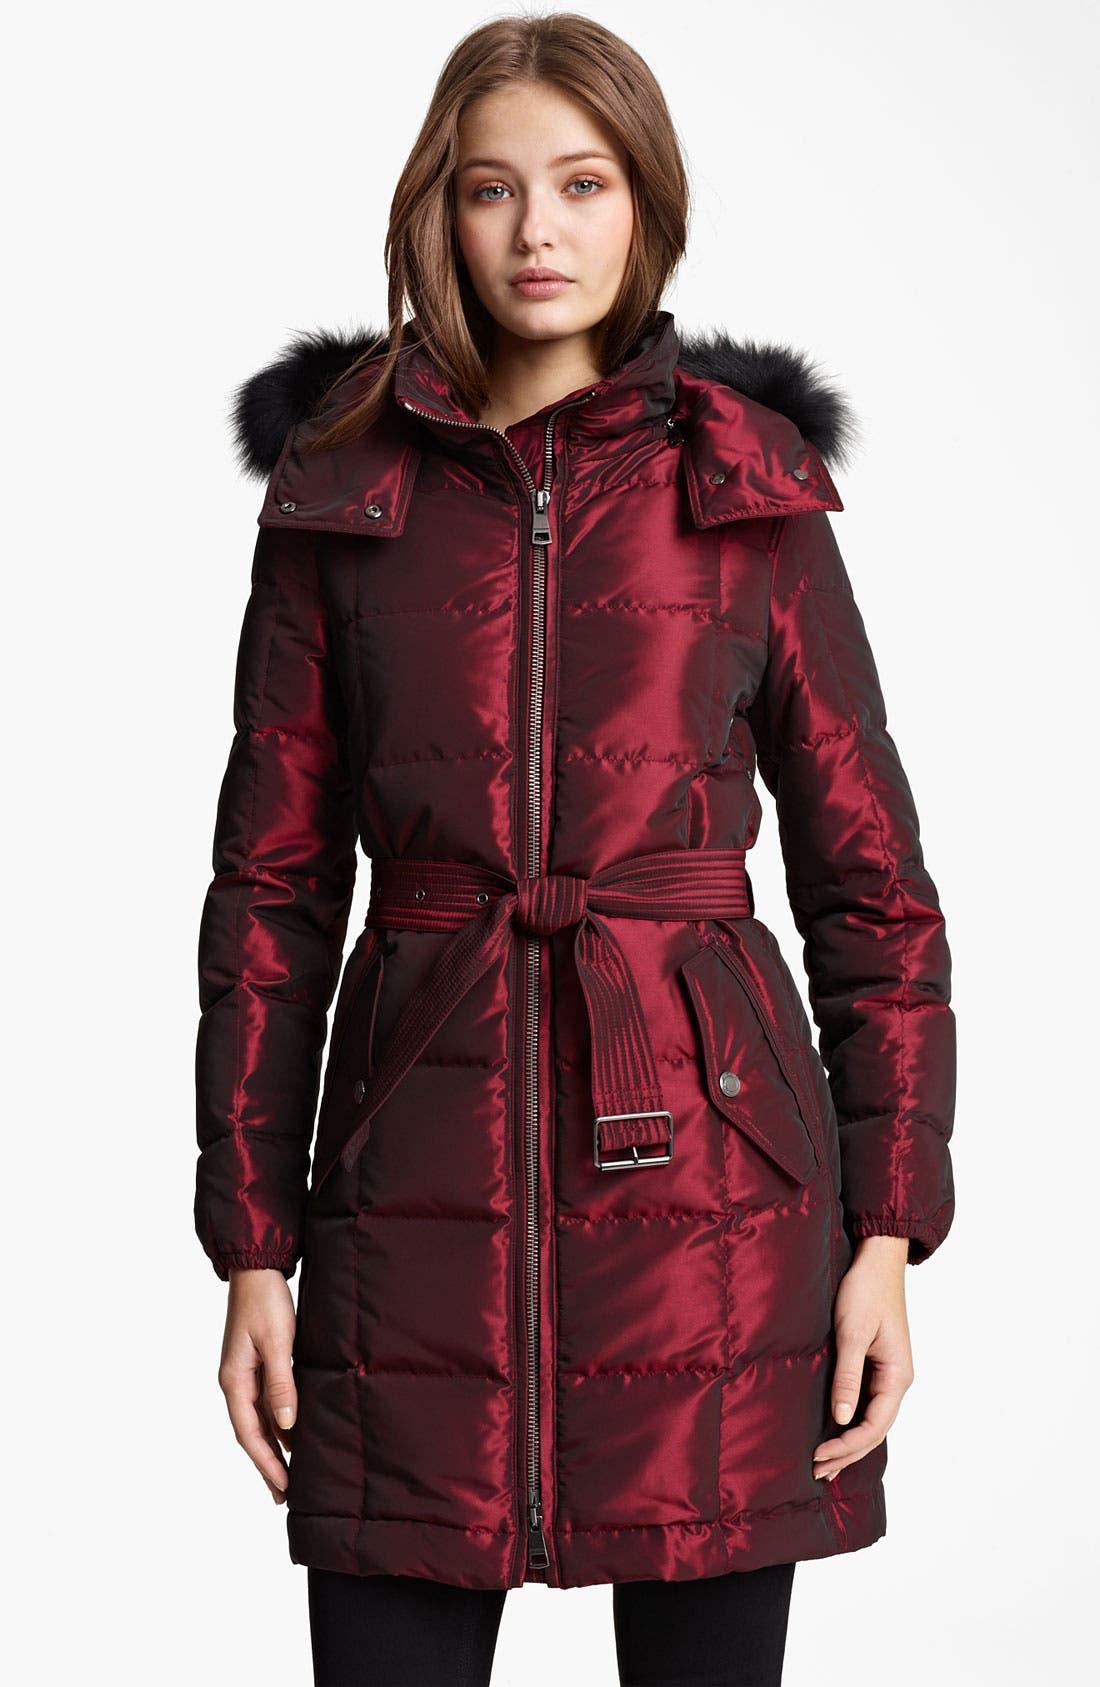 Main Image - Burberry Brit Quilted Genuine Fox Fur Trim Down Jacket (Online Exclusive)